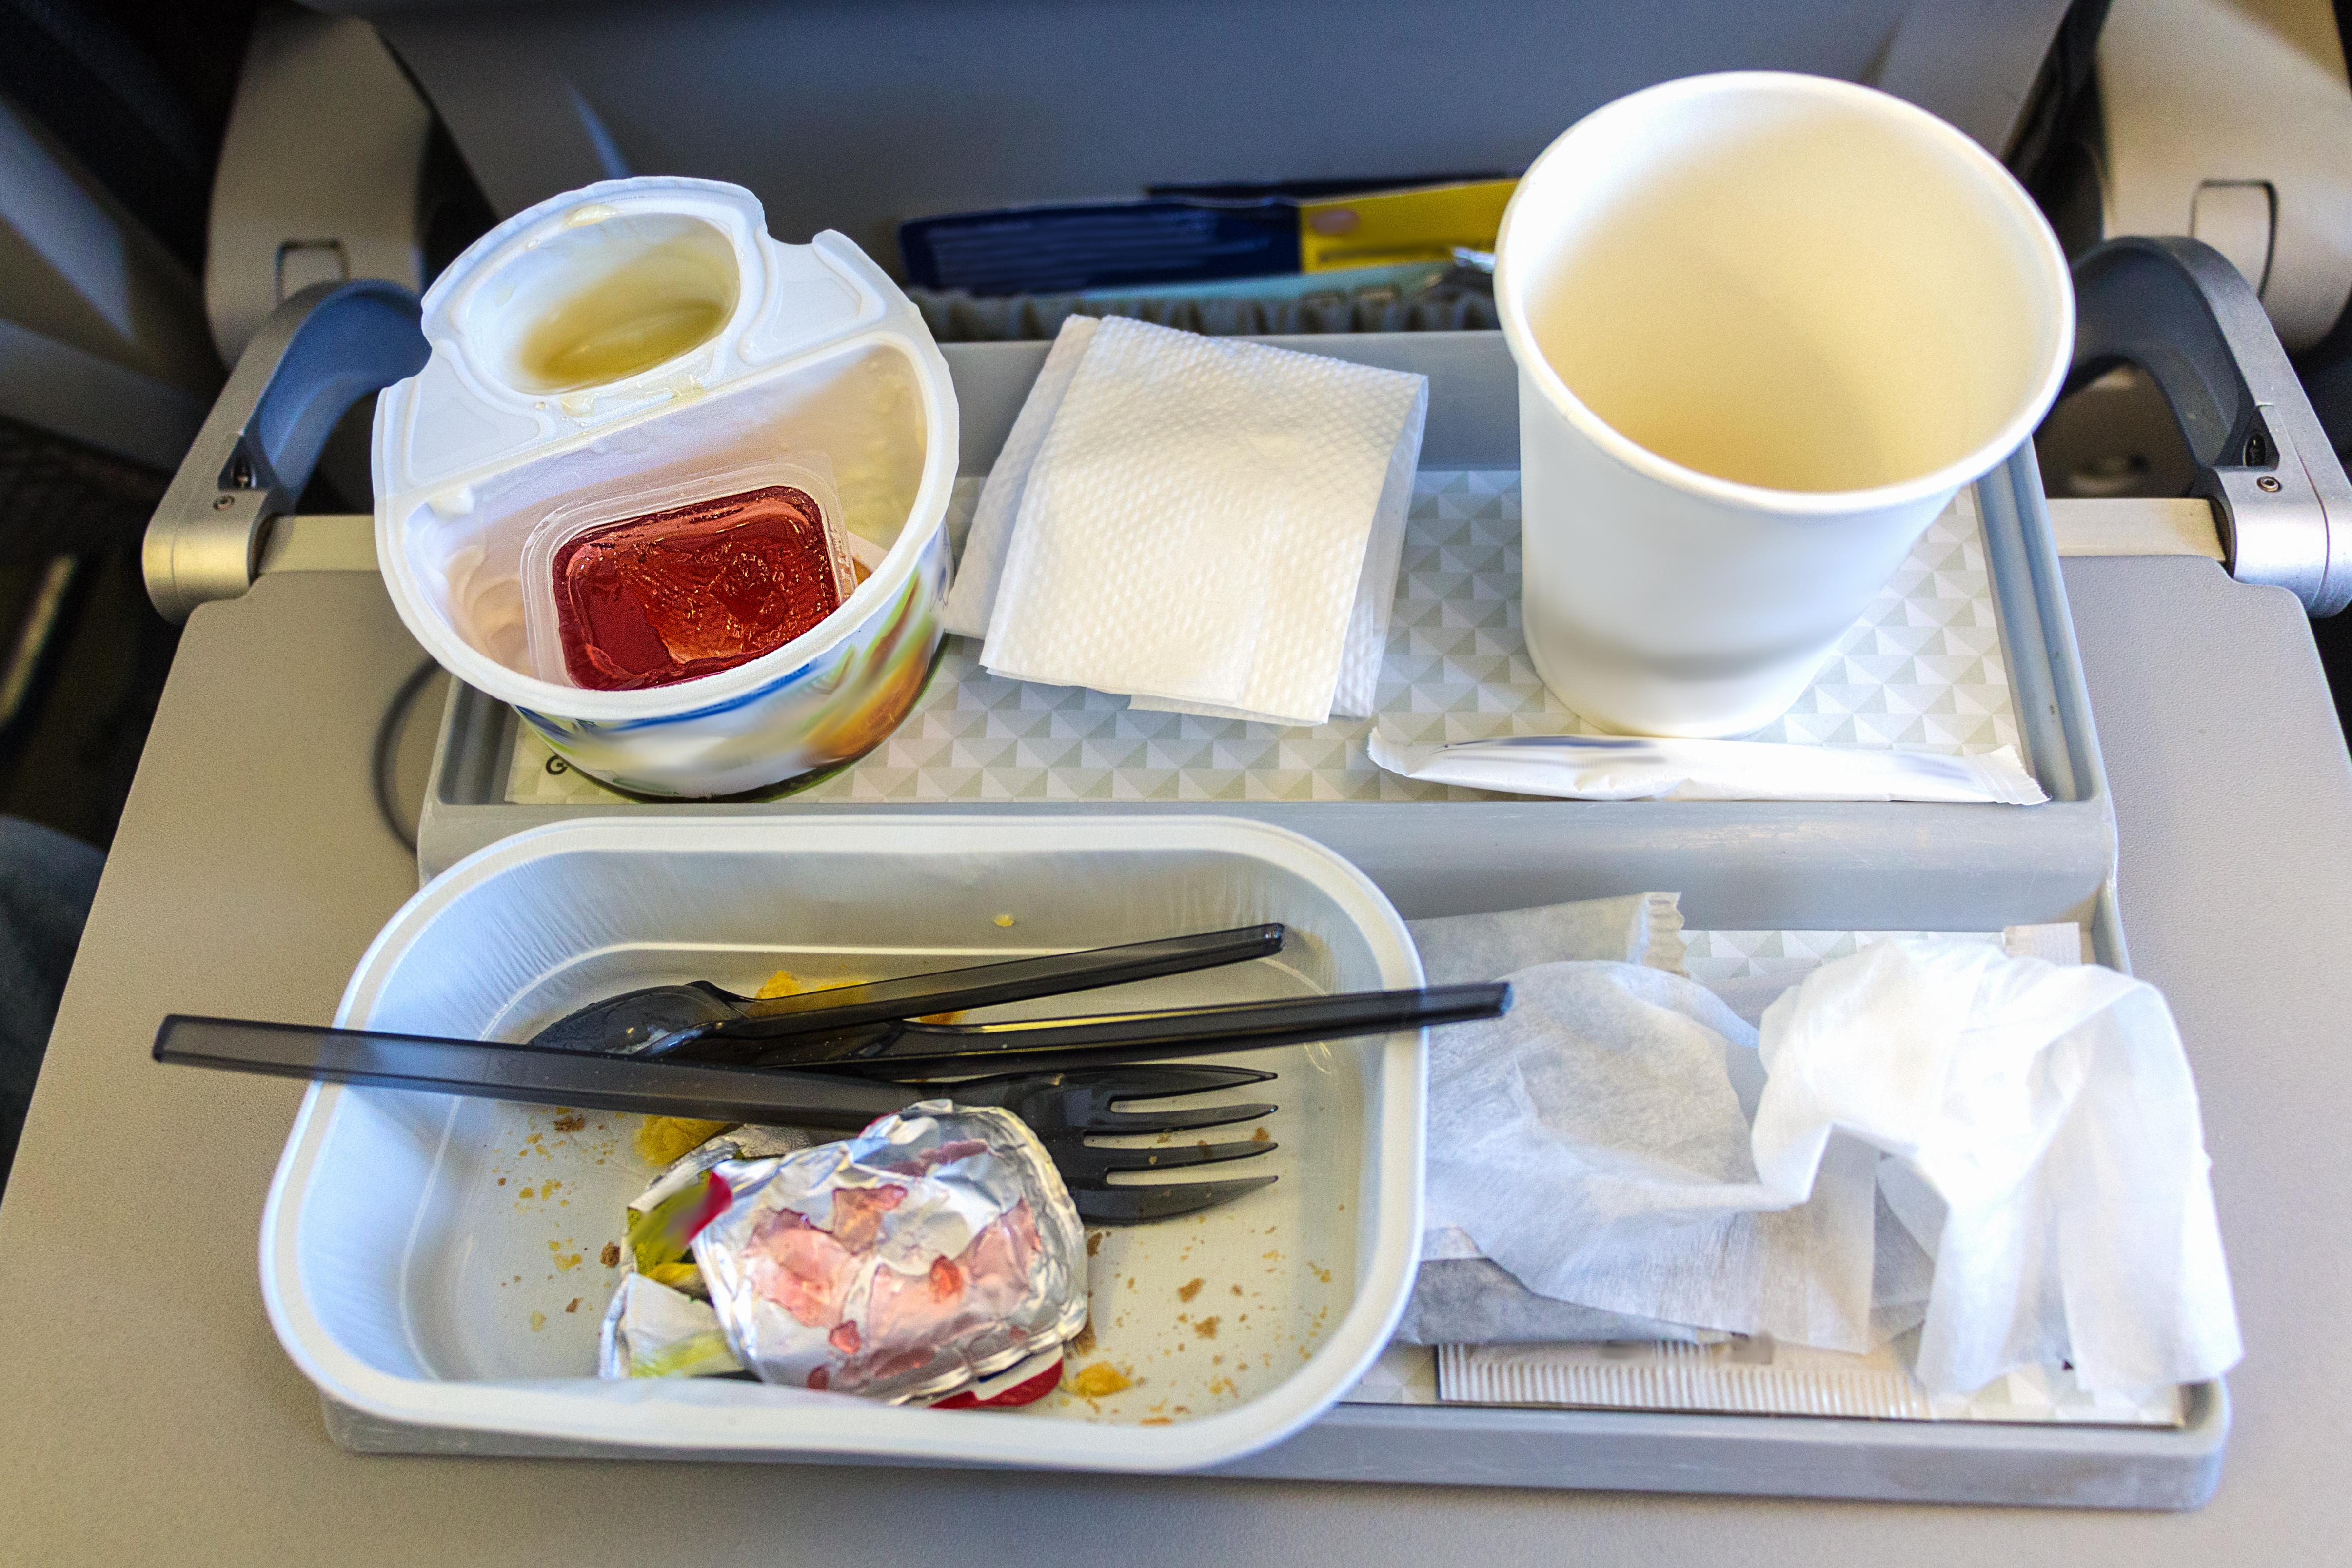 In flight meal breakfast leftovers.